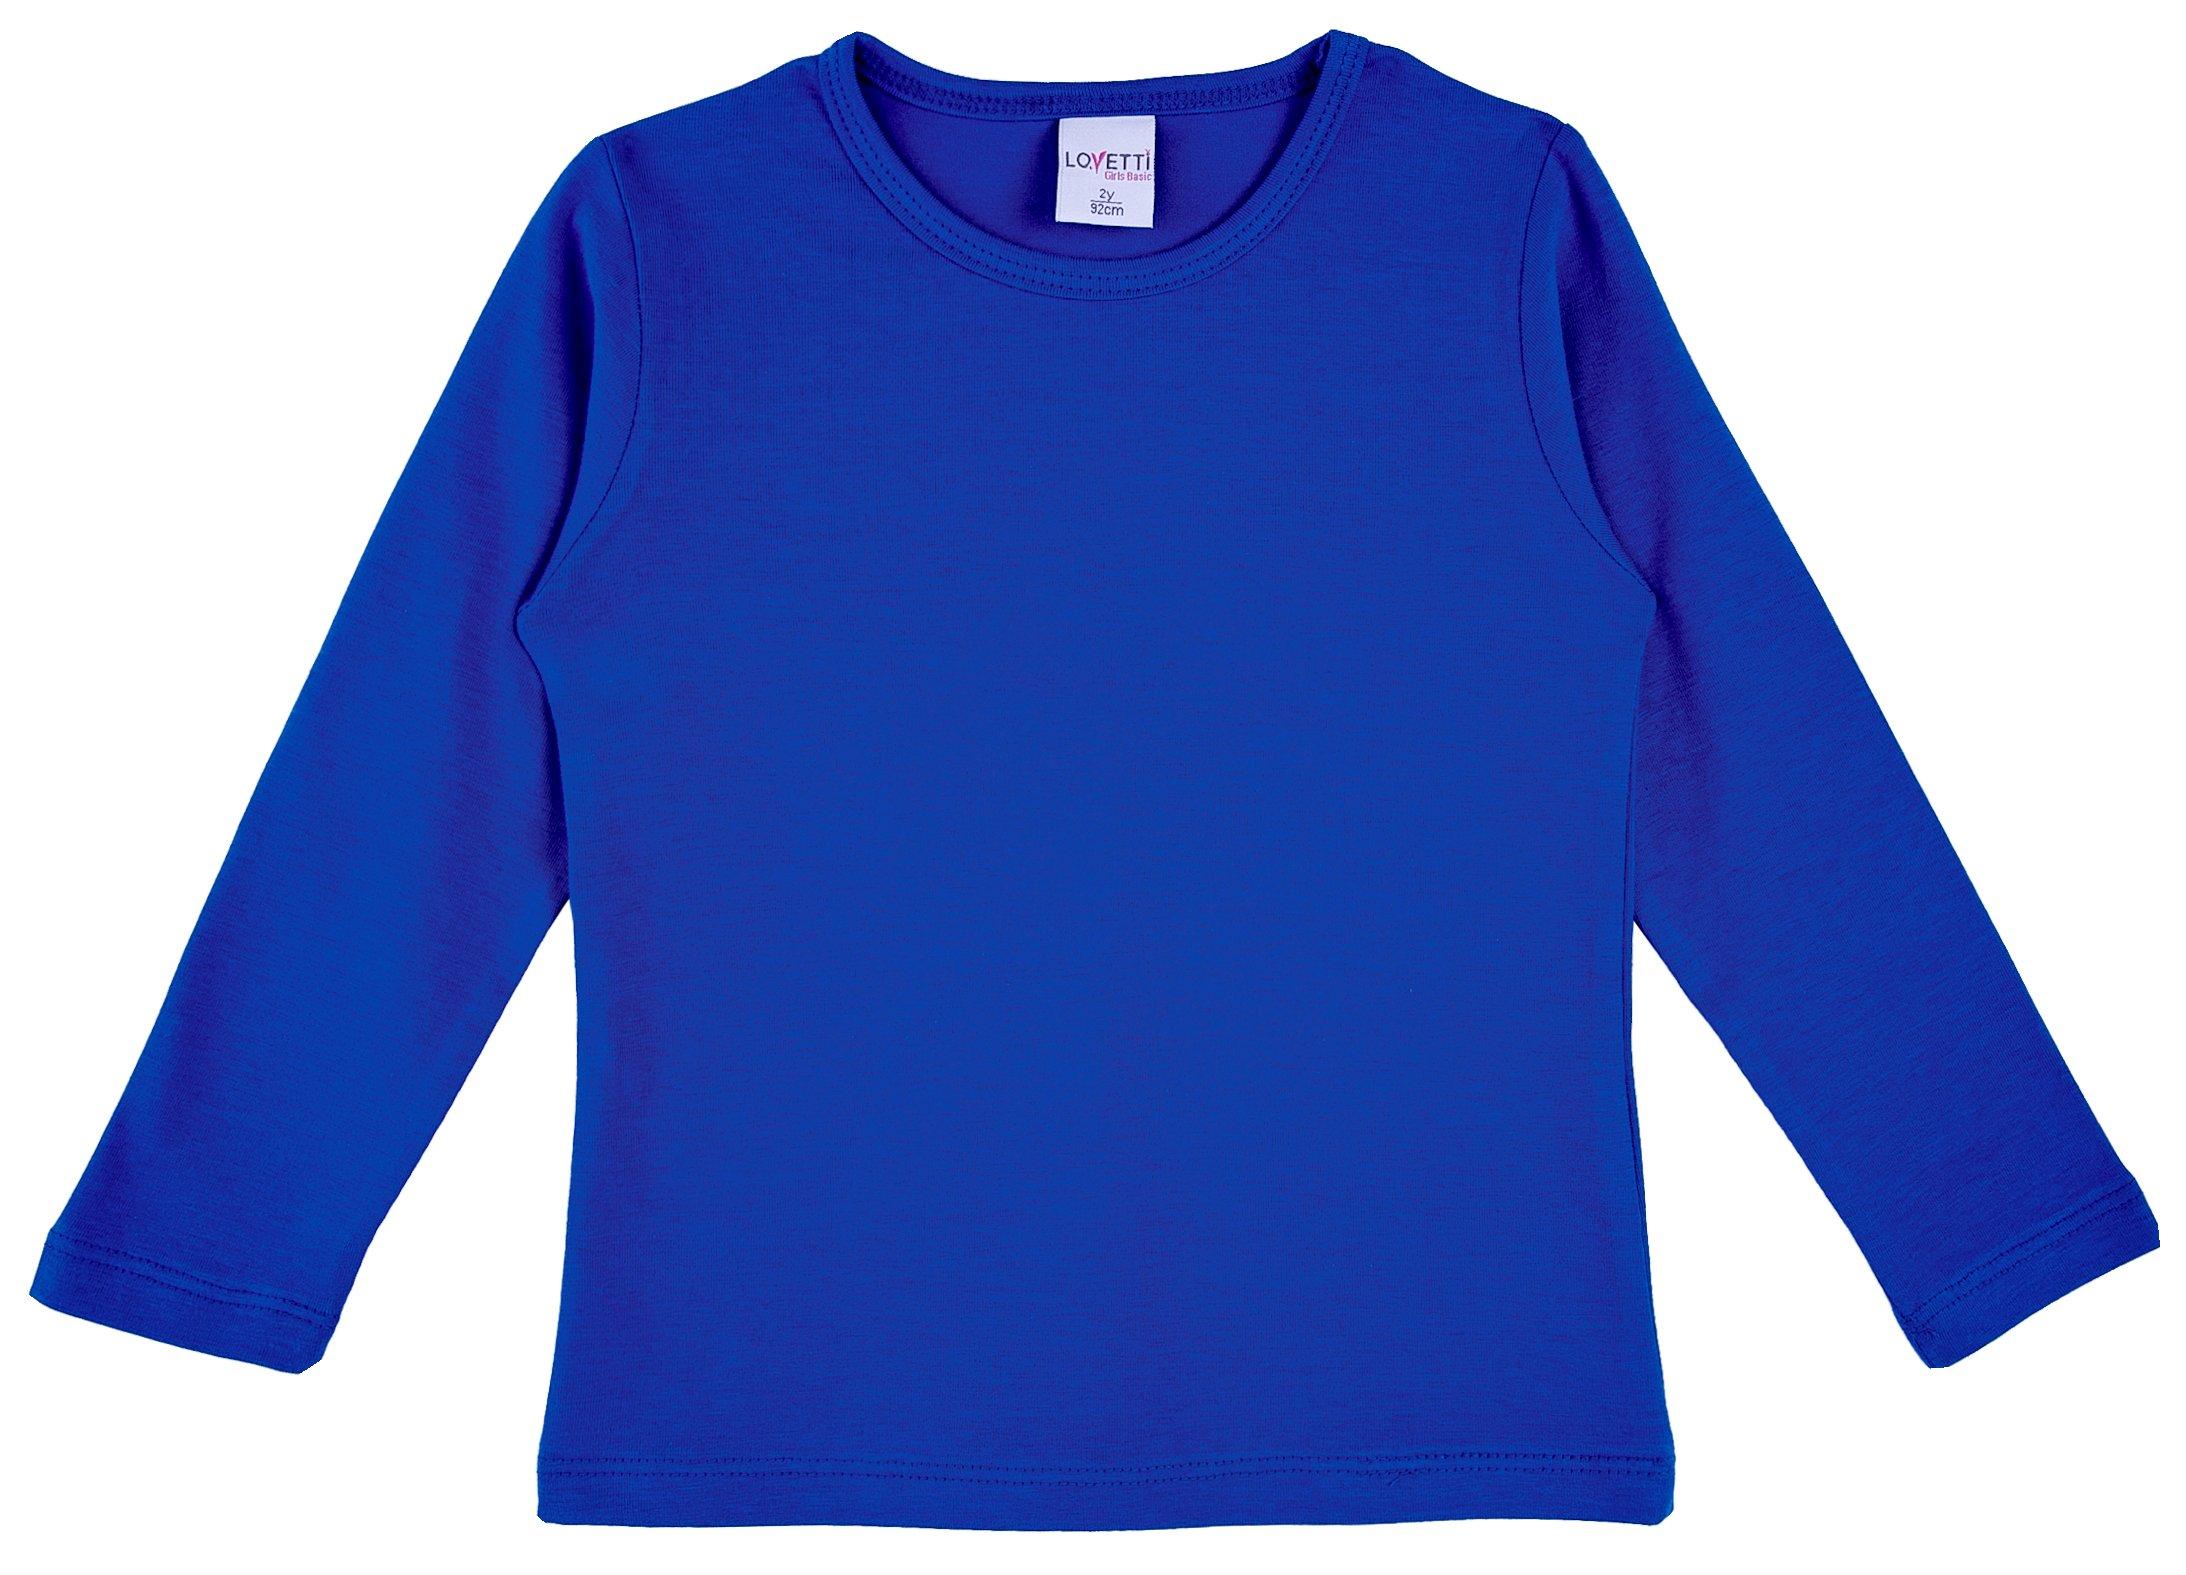 Lovetti Girls' Basic Long Sleeve Round Neck T-Shirt 3T Royal by Lovetti